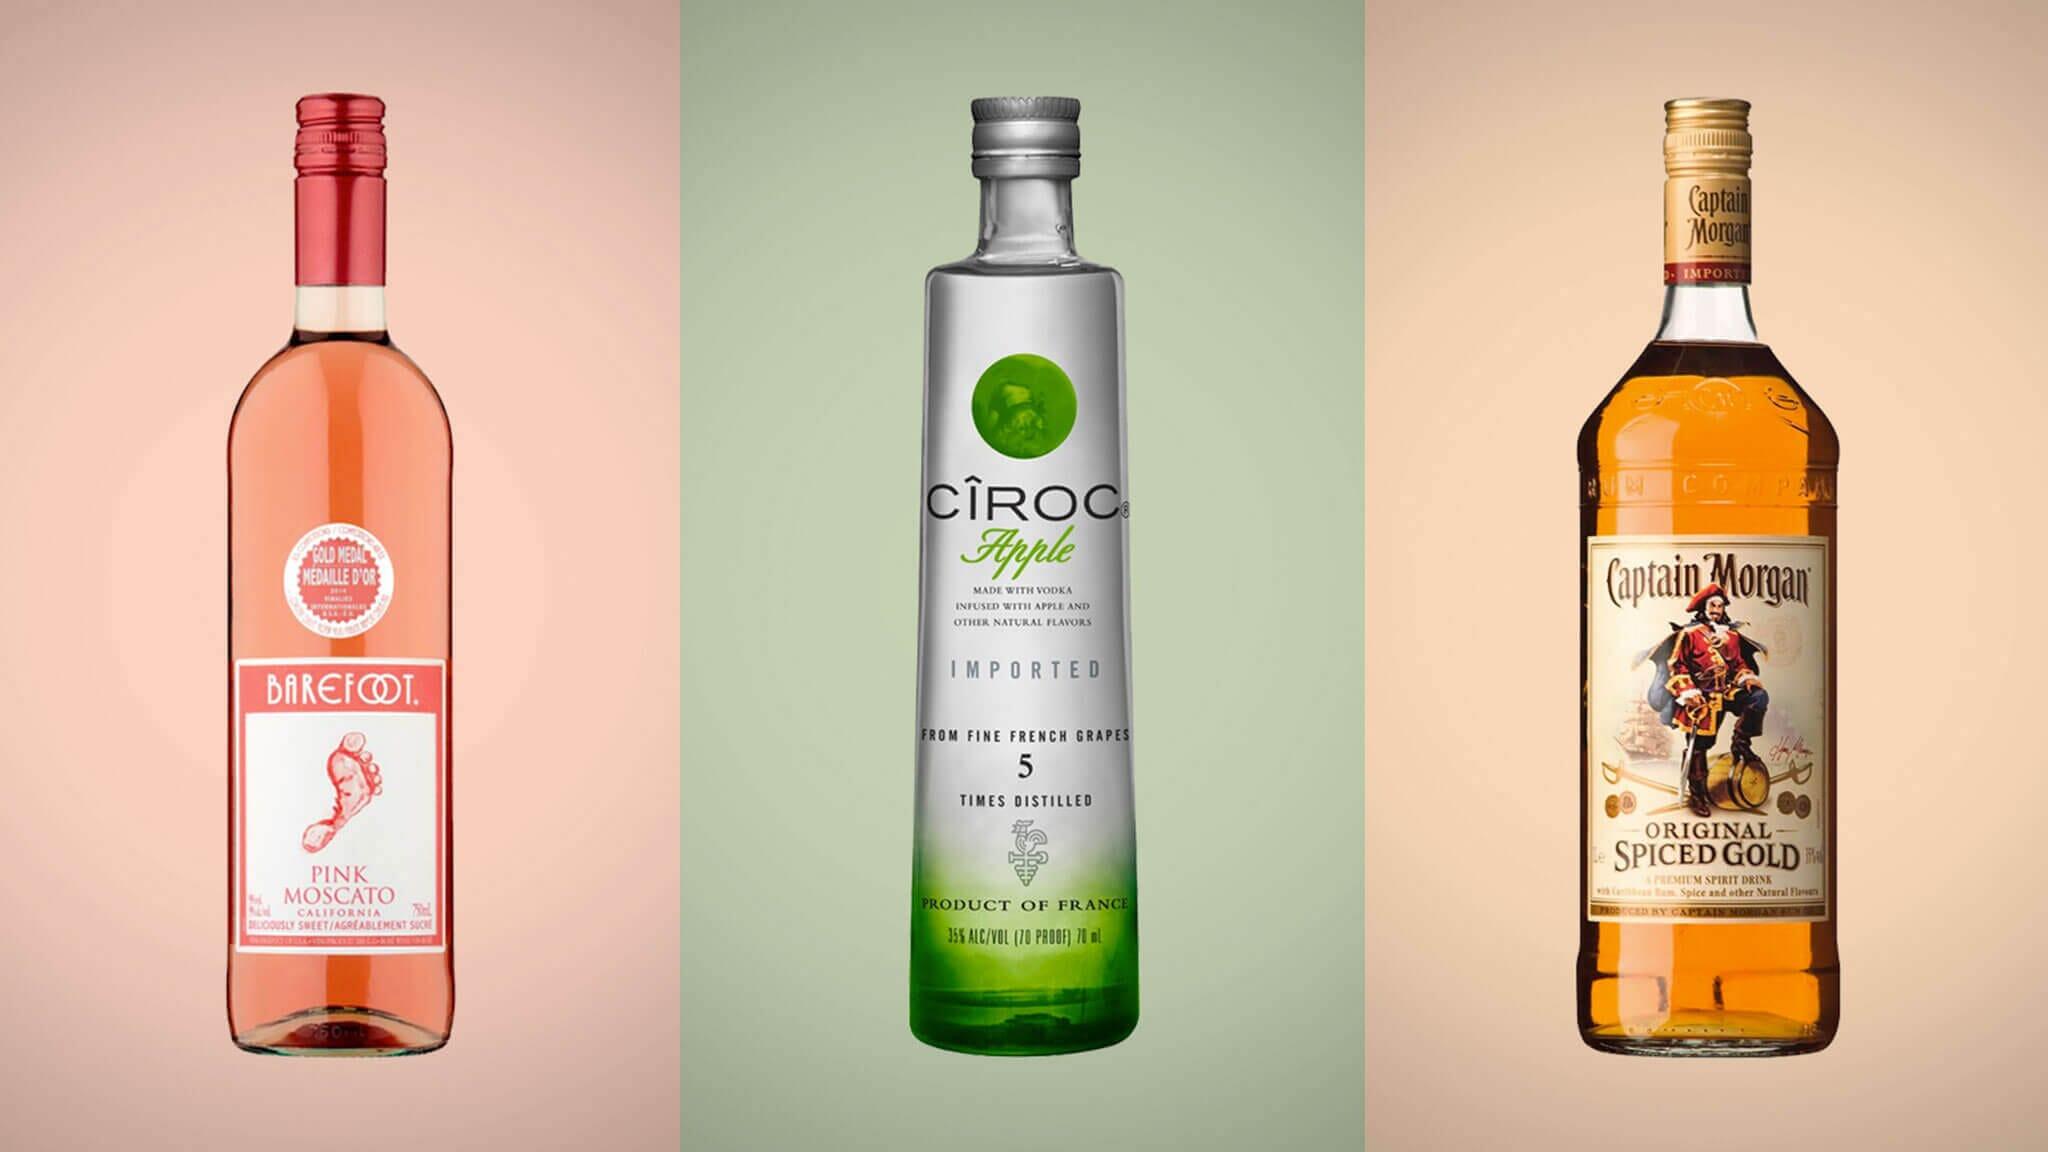 ecommerce-images-bottles-of-alcohol